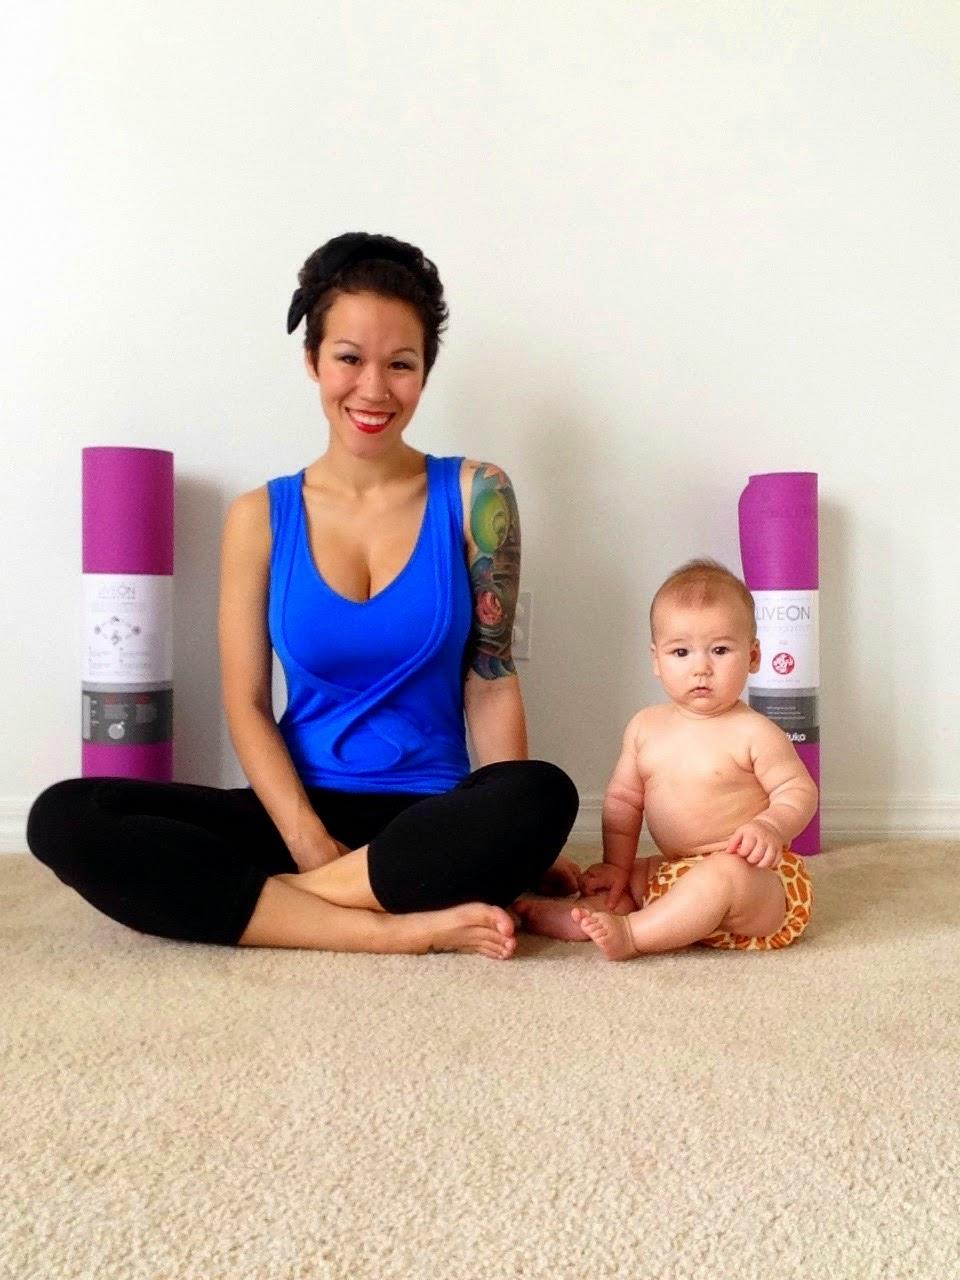 Diary Of A Fit Mommy Manduka Liveon Mommy Amp Me Yoga Mat